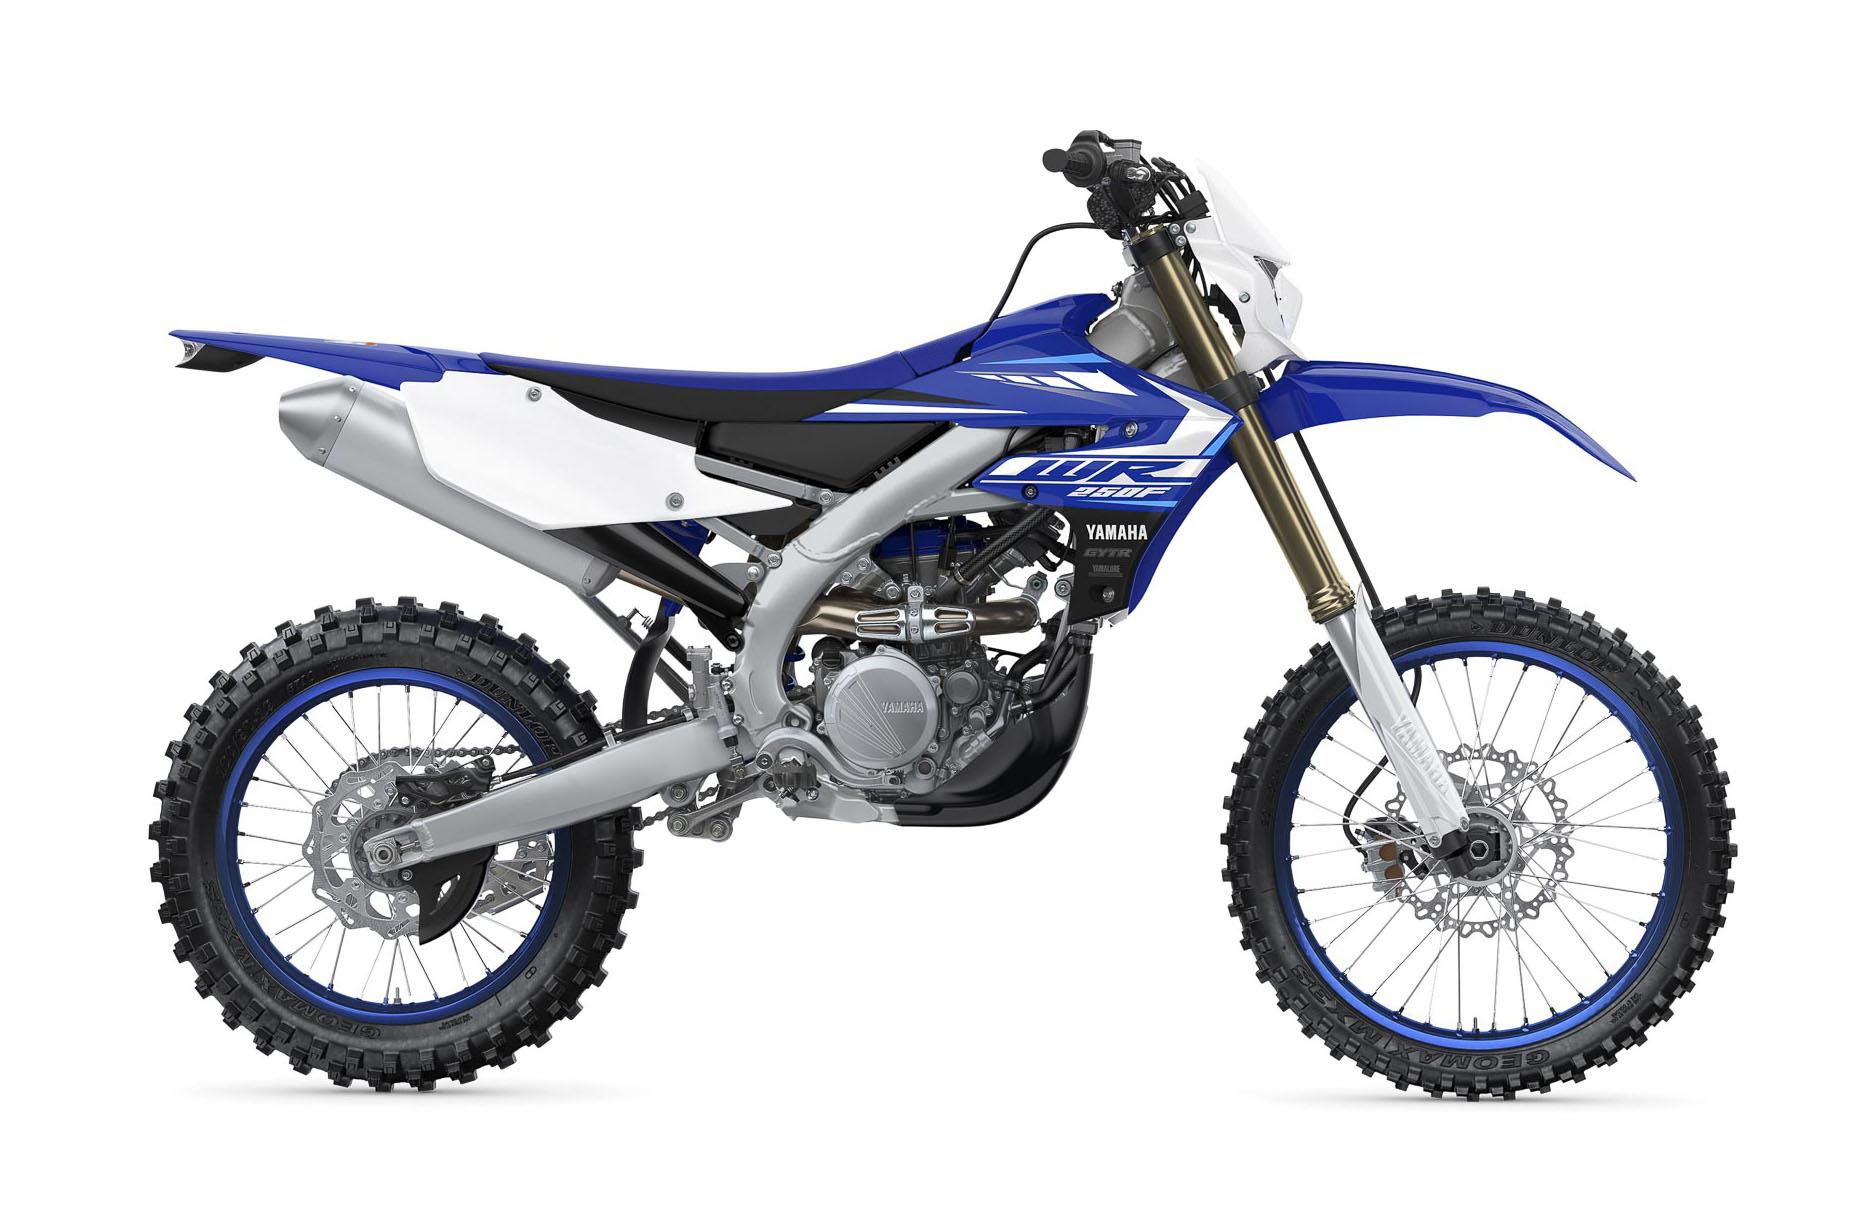 Motor Trail Yamaha WR250F 2020, Siap Untuk Kompetisi Enduro